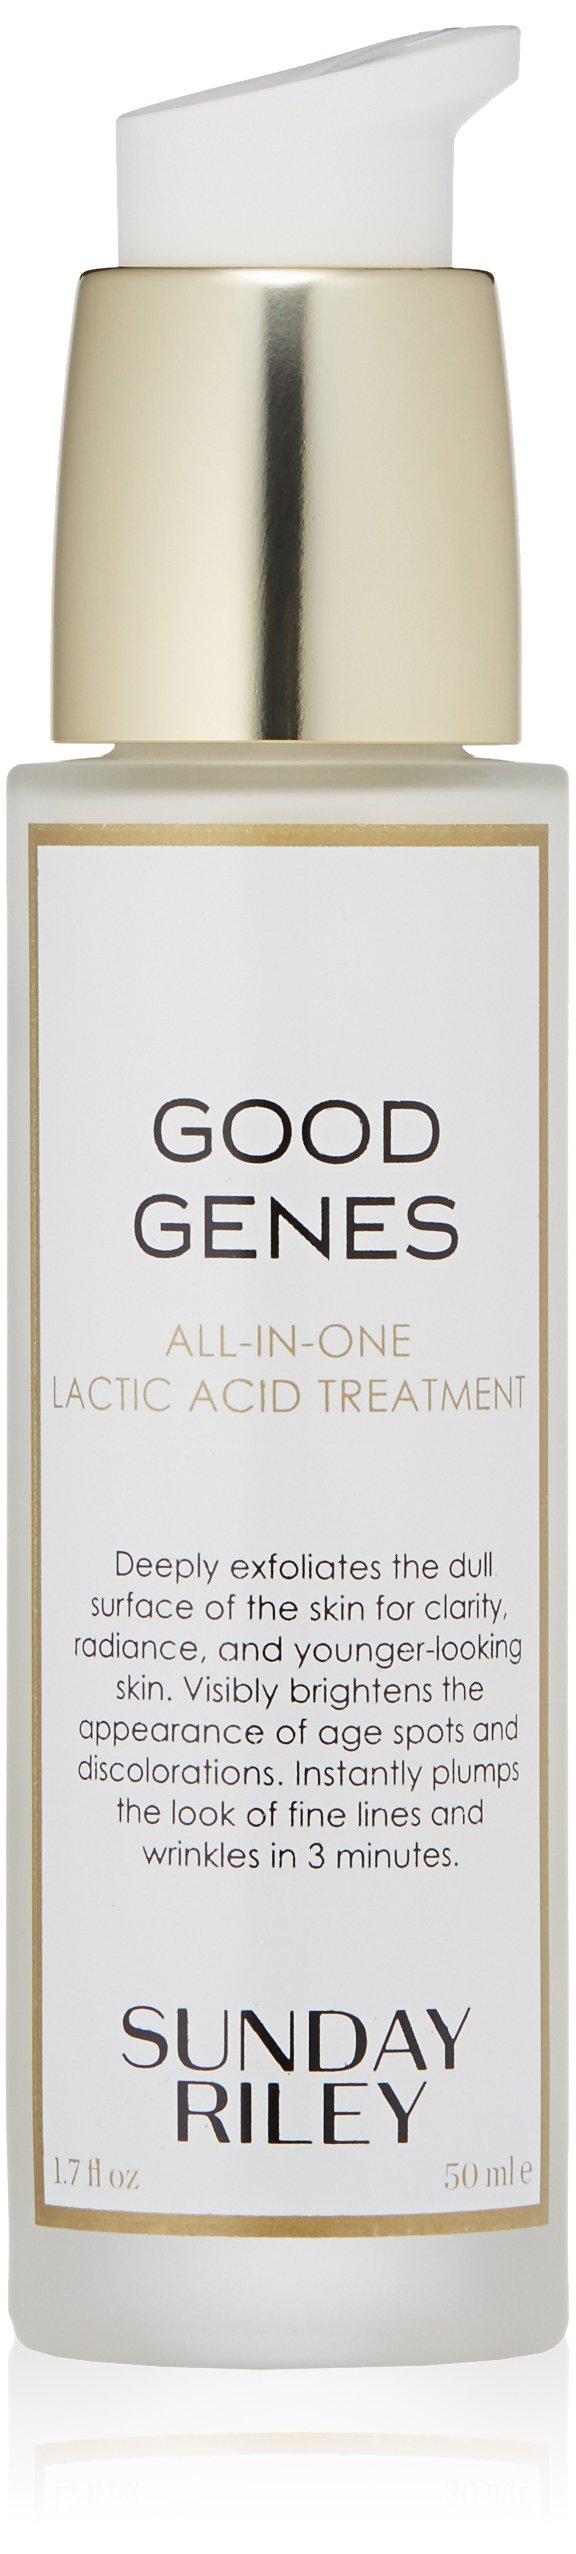 Sunday Riley Good Genes All-in-One Lactic Acid Treatment, 1.7 Fl Oz